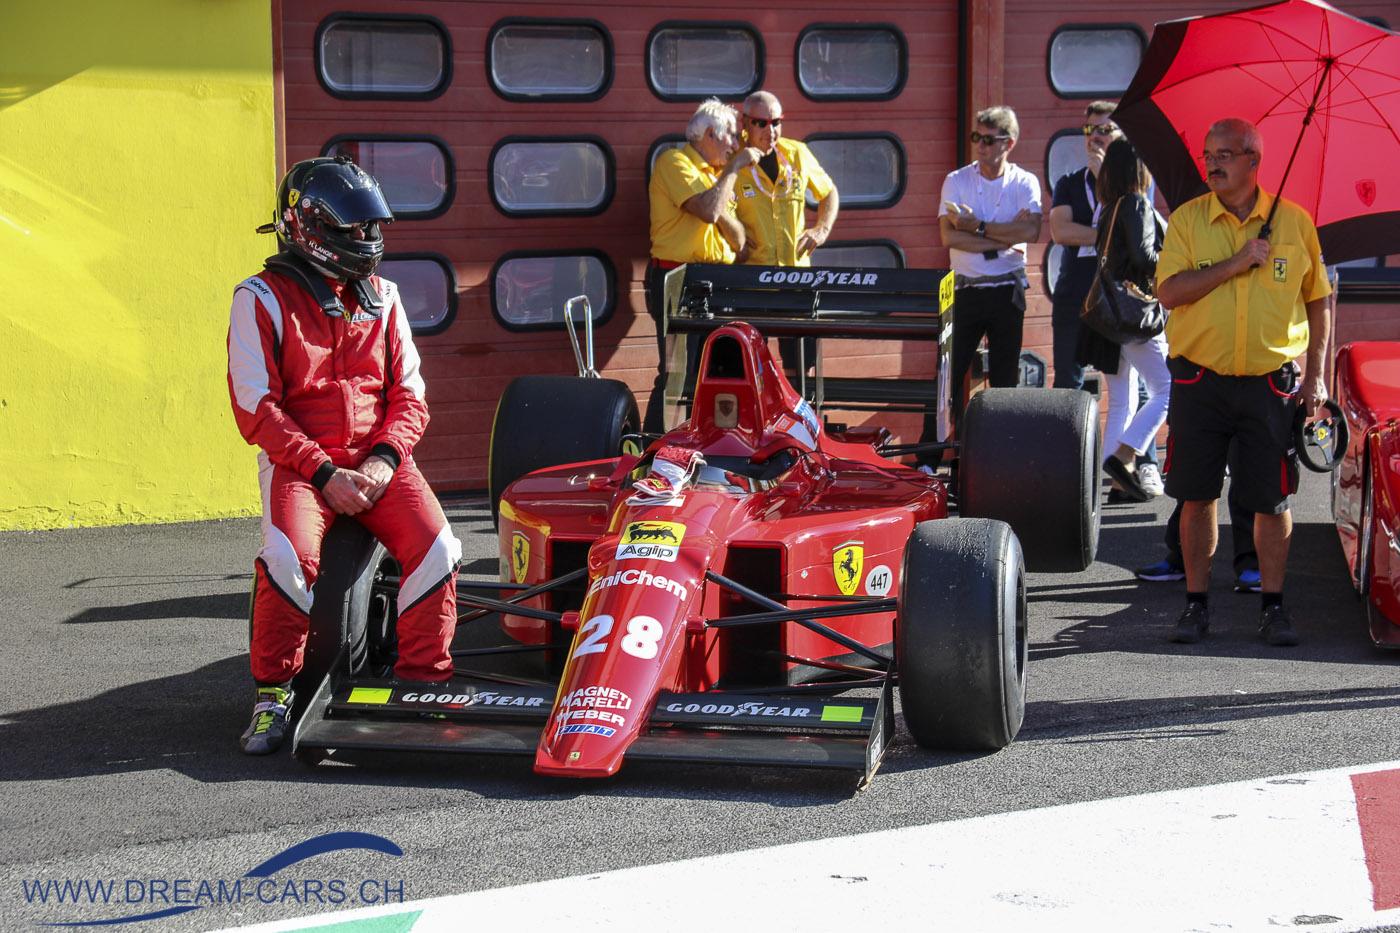 Ferrari 640 von 1989 am Finali Mondiali in Mugello 2019